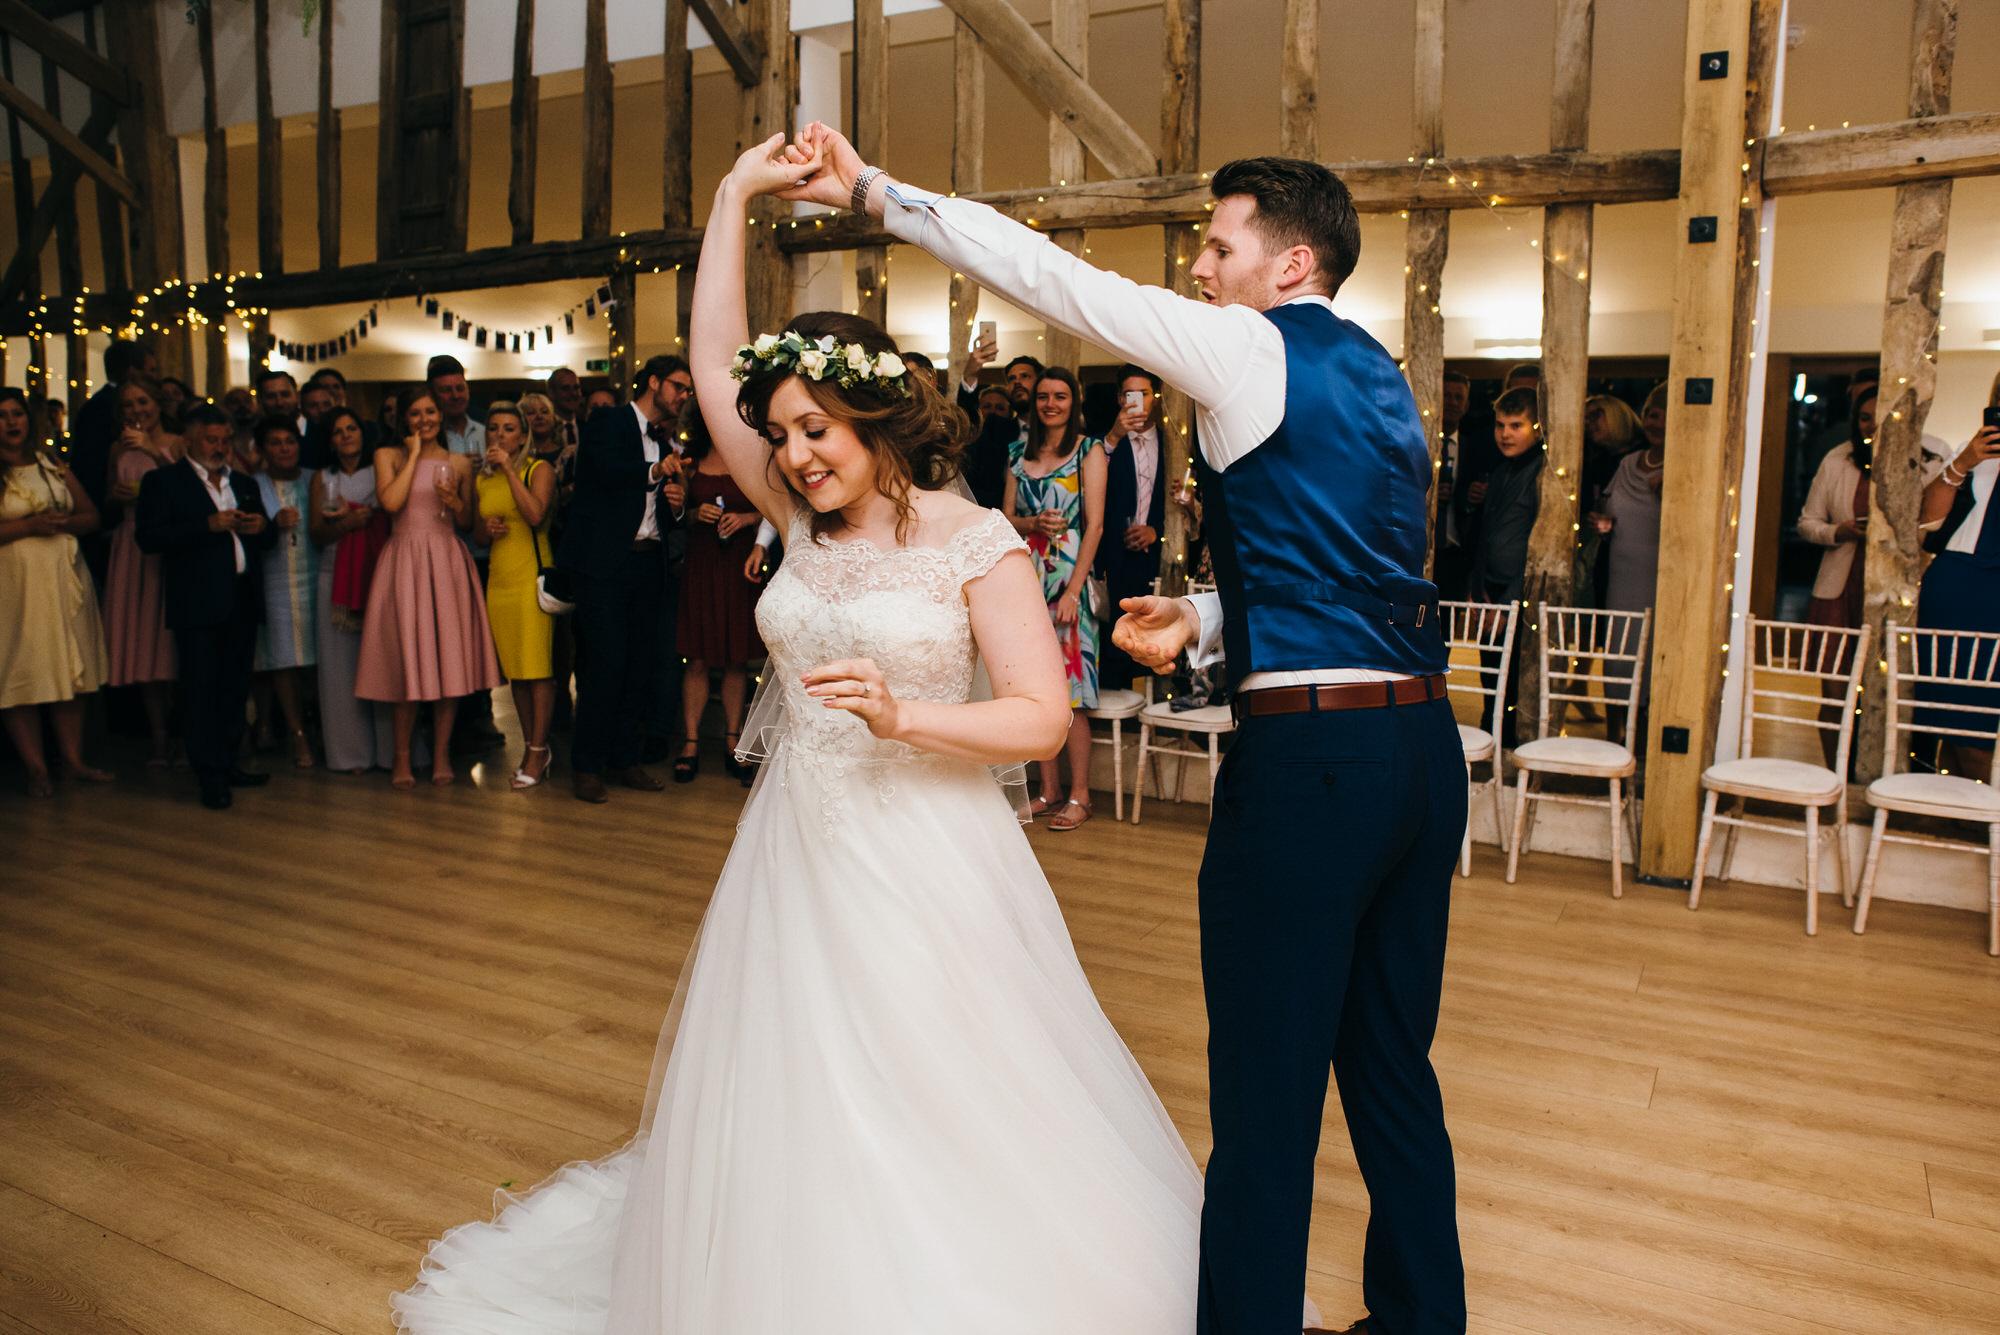 Colville hall wedding first dance